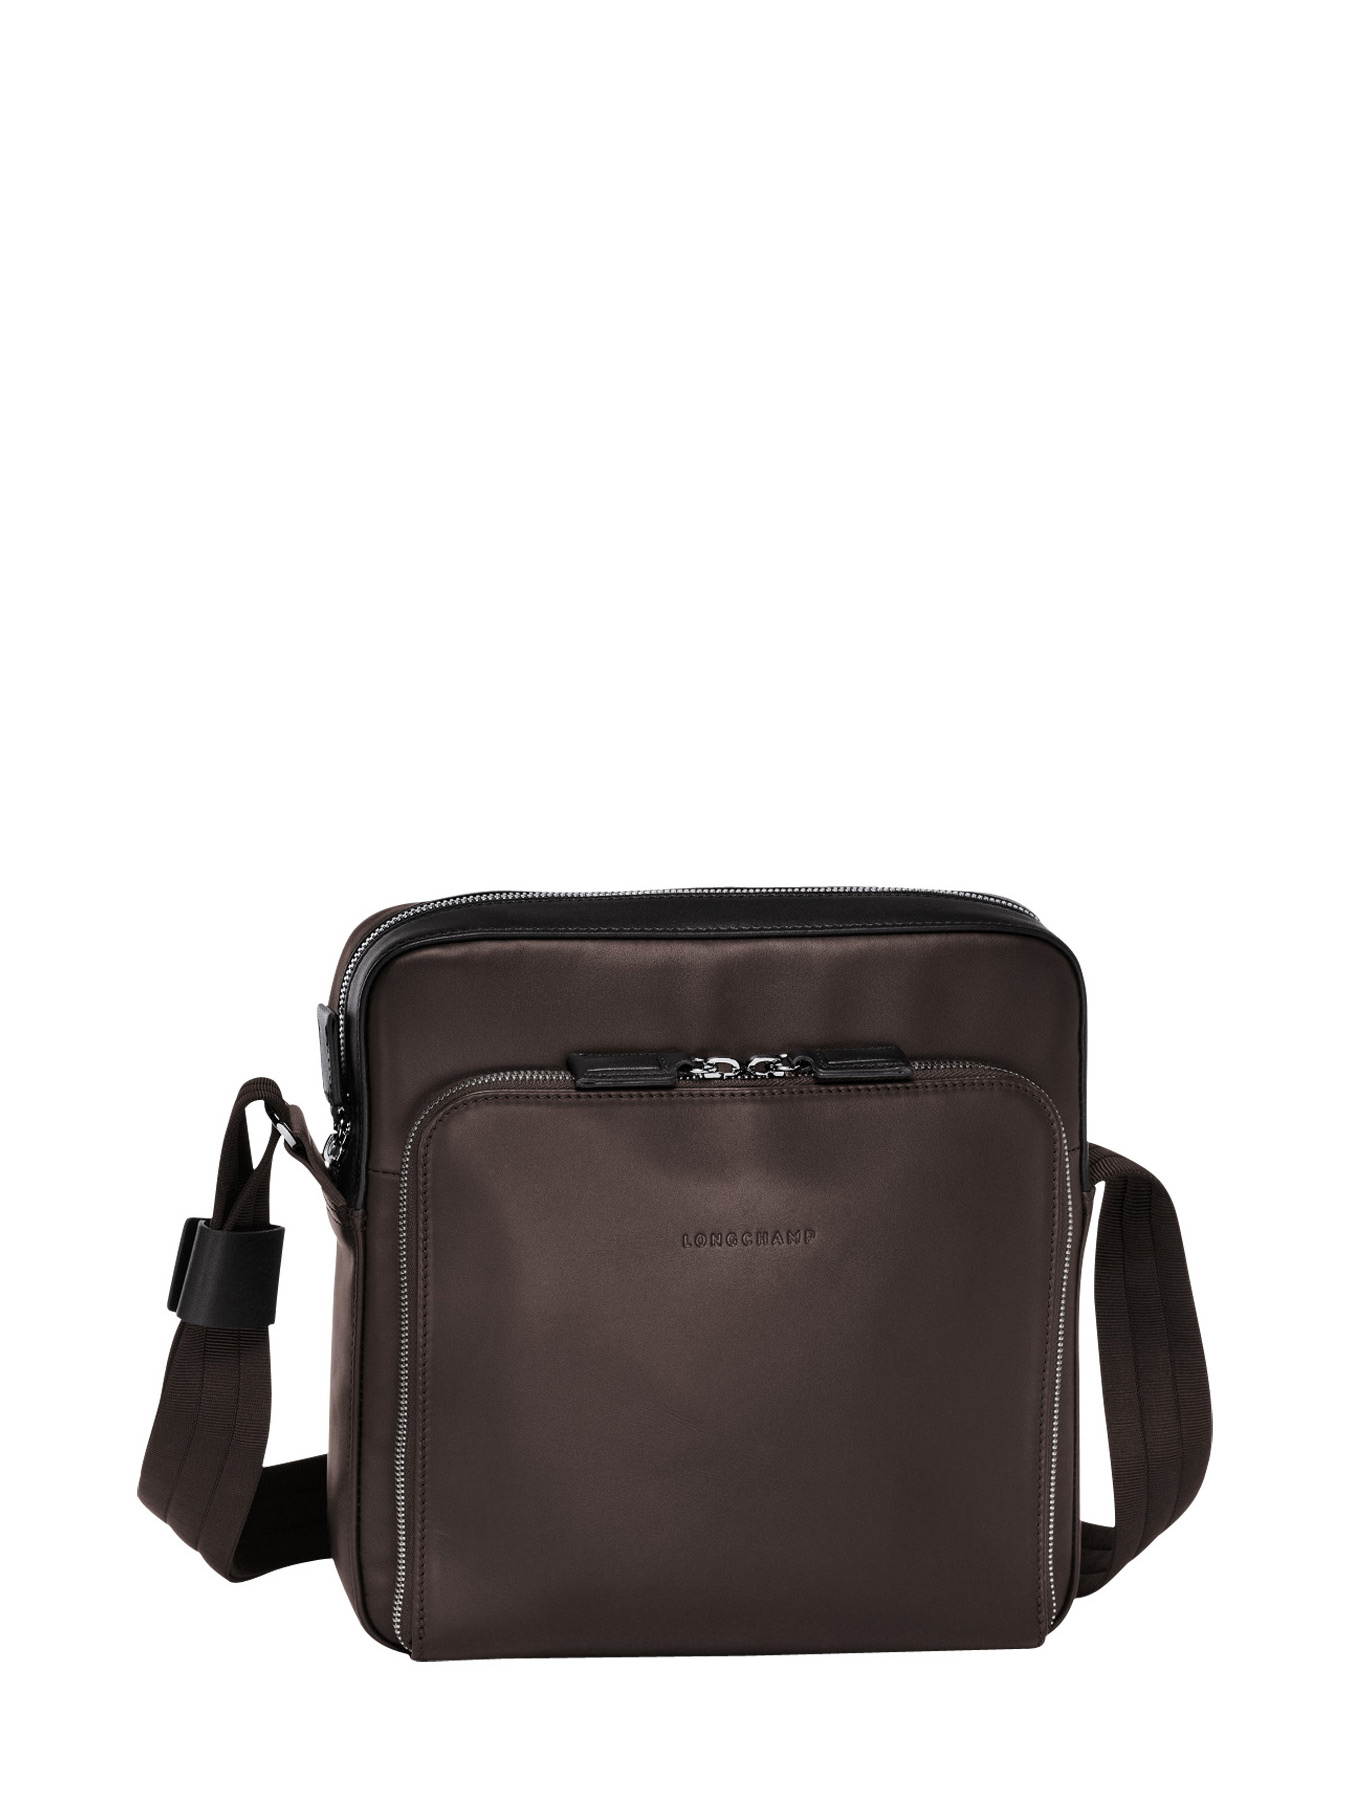 Longchamp Besace Marron